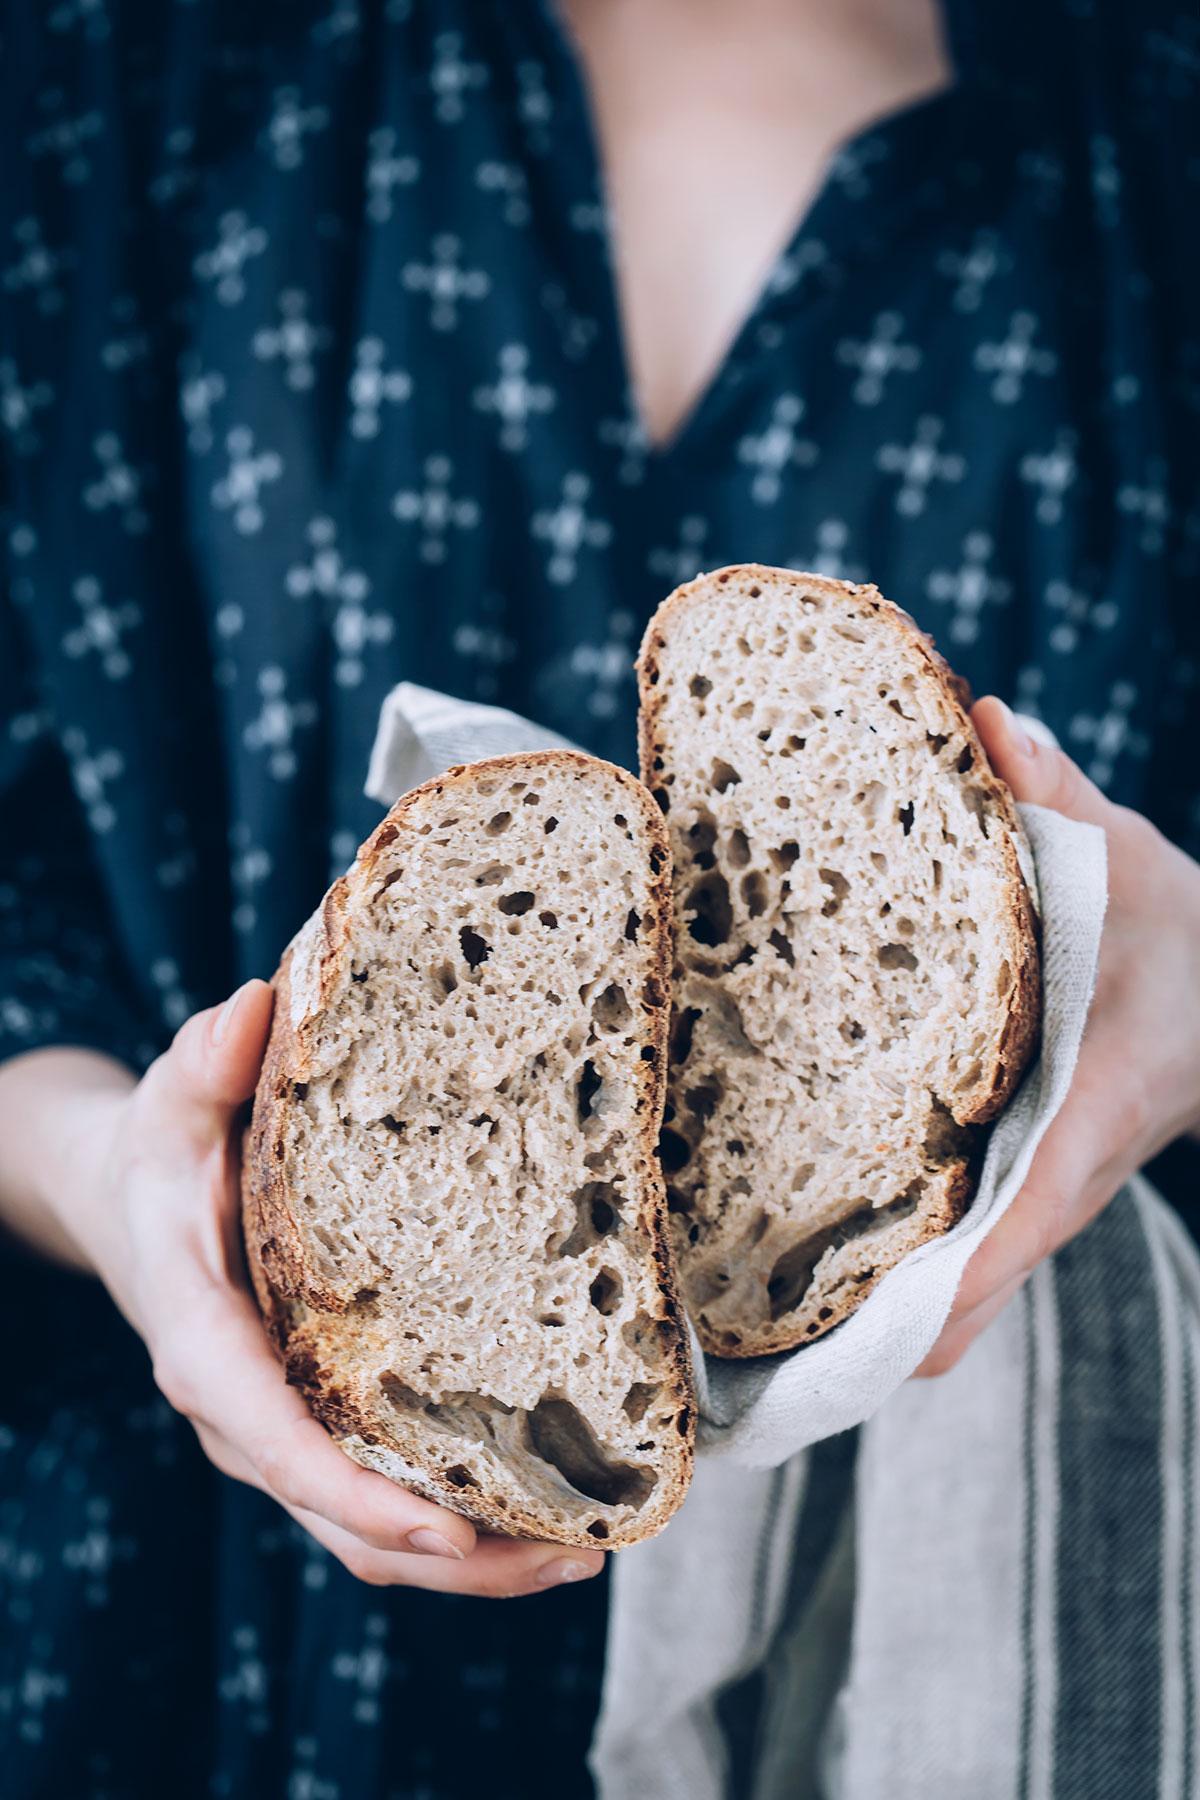 How to Make Sourdough Bread Starter